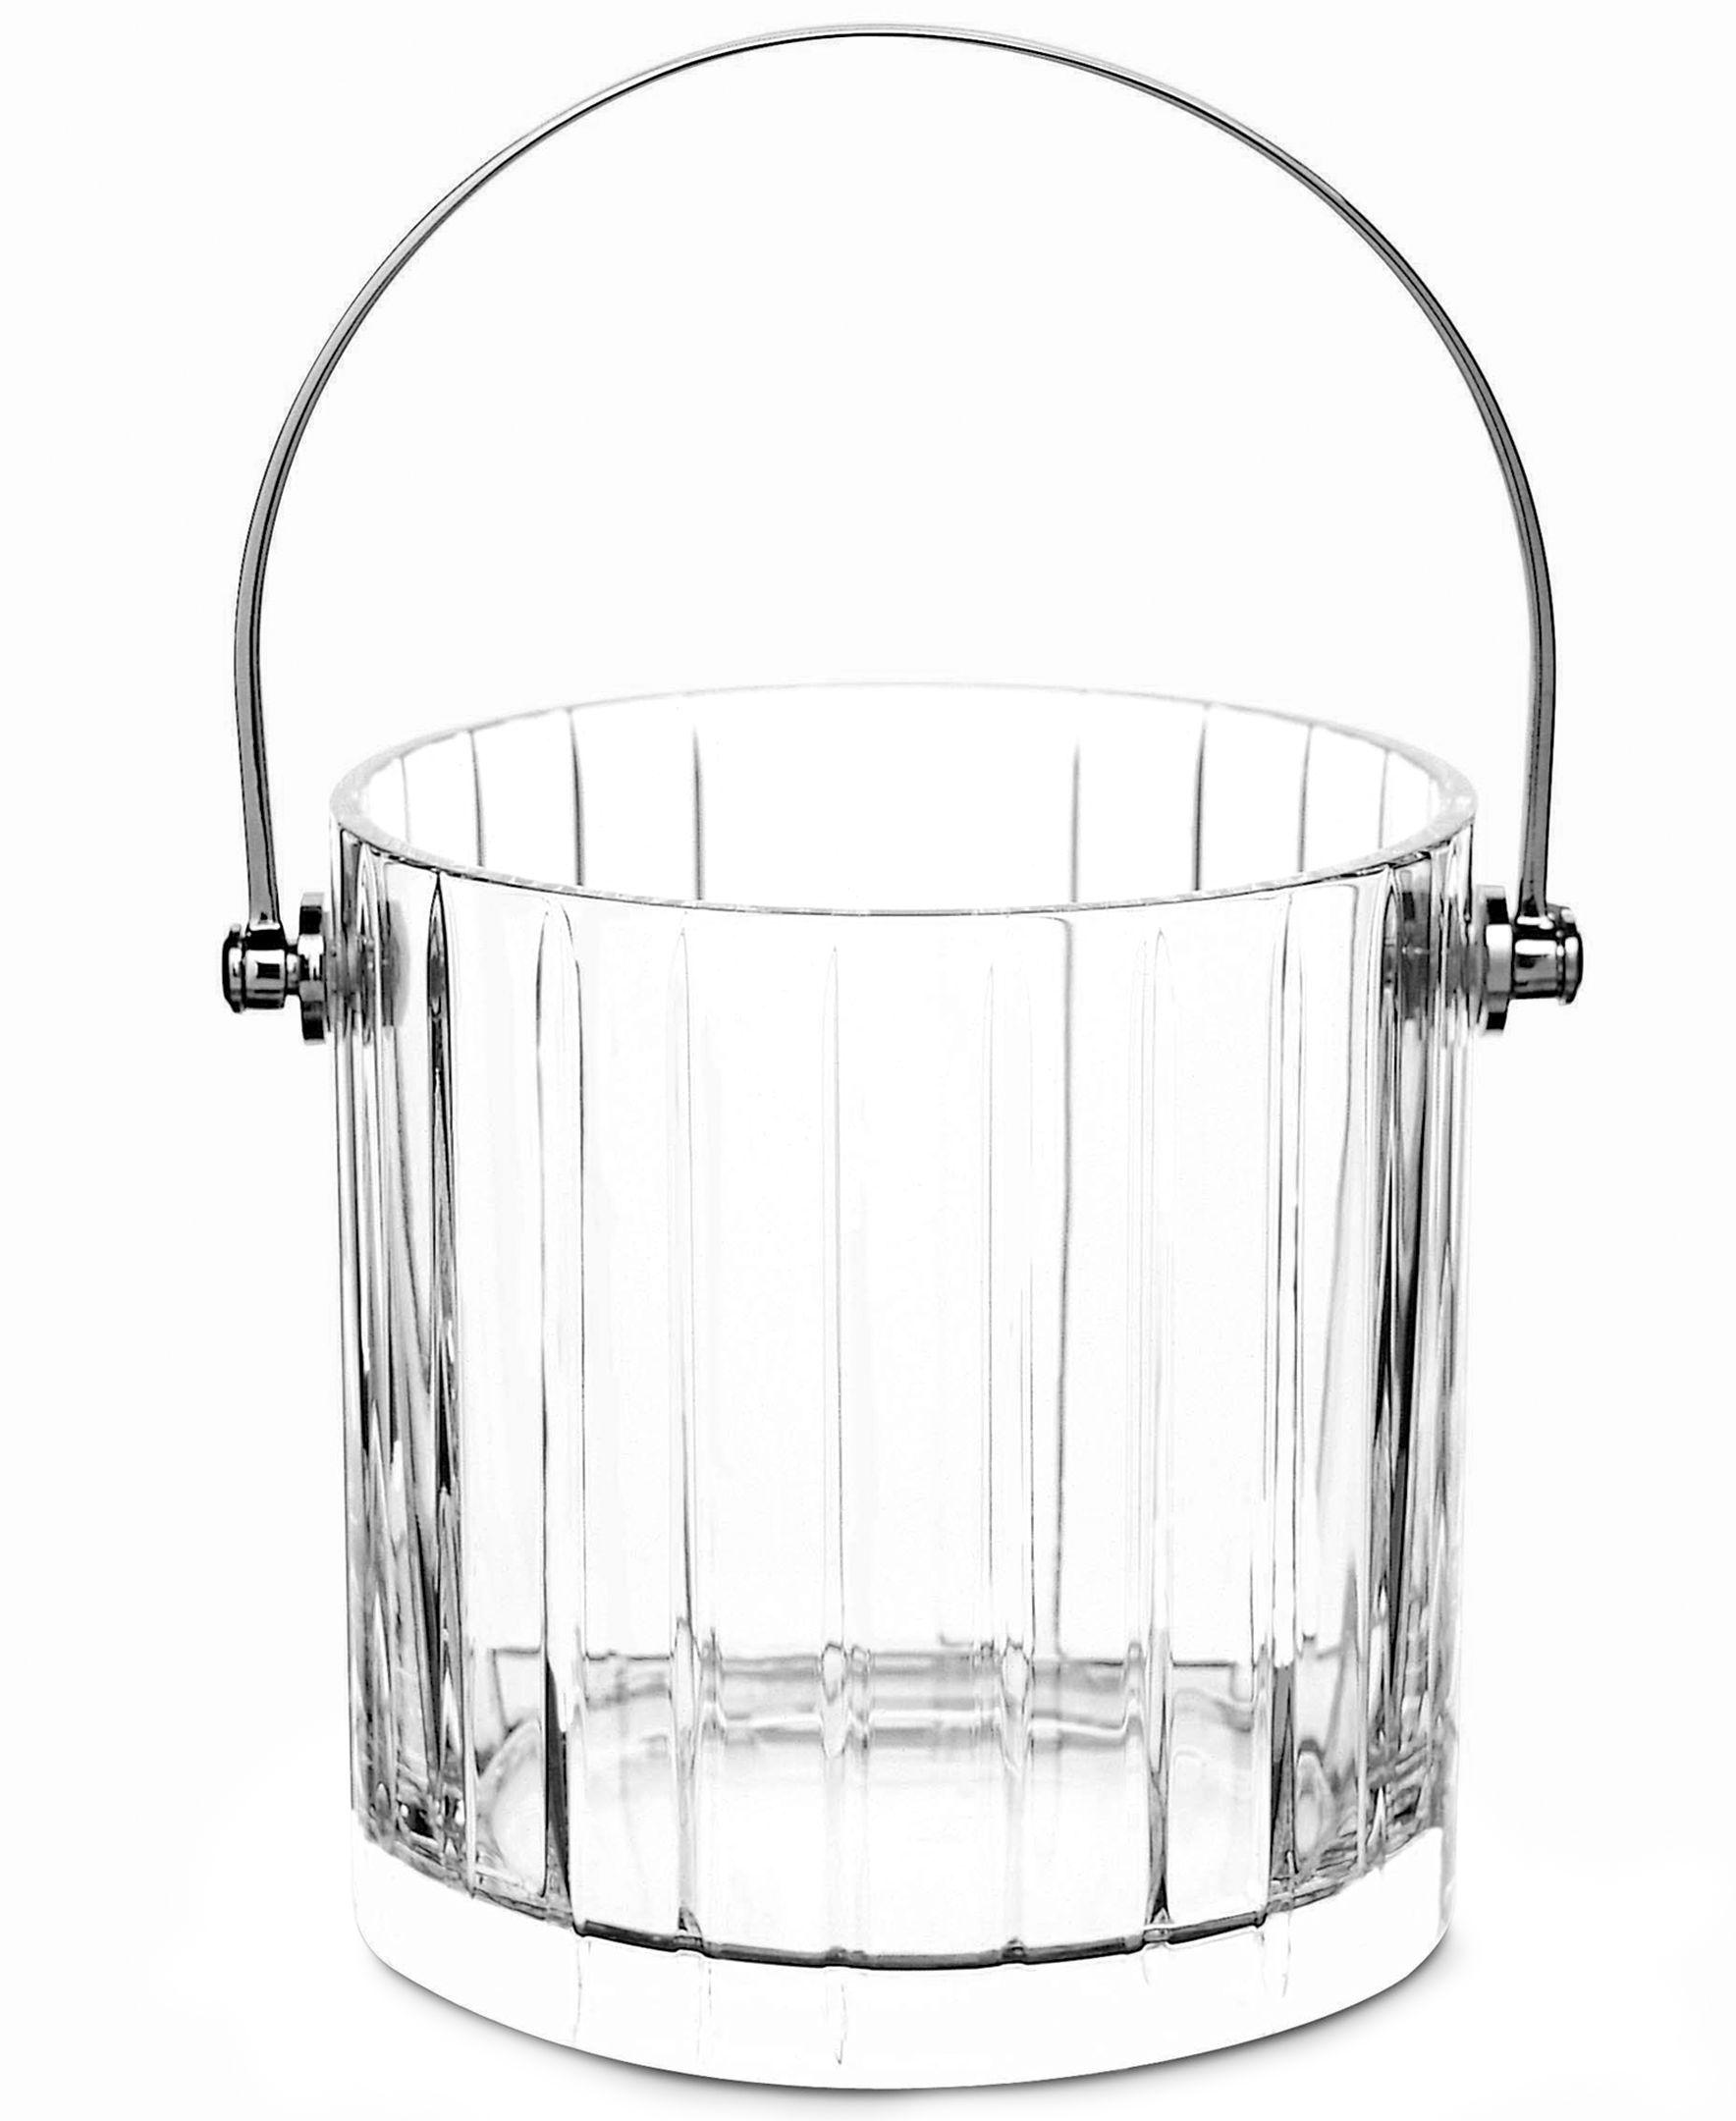 Baccarat Harmonie Ice Bucket Bar accessories, Baccarat